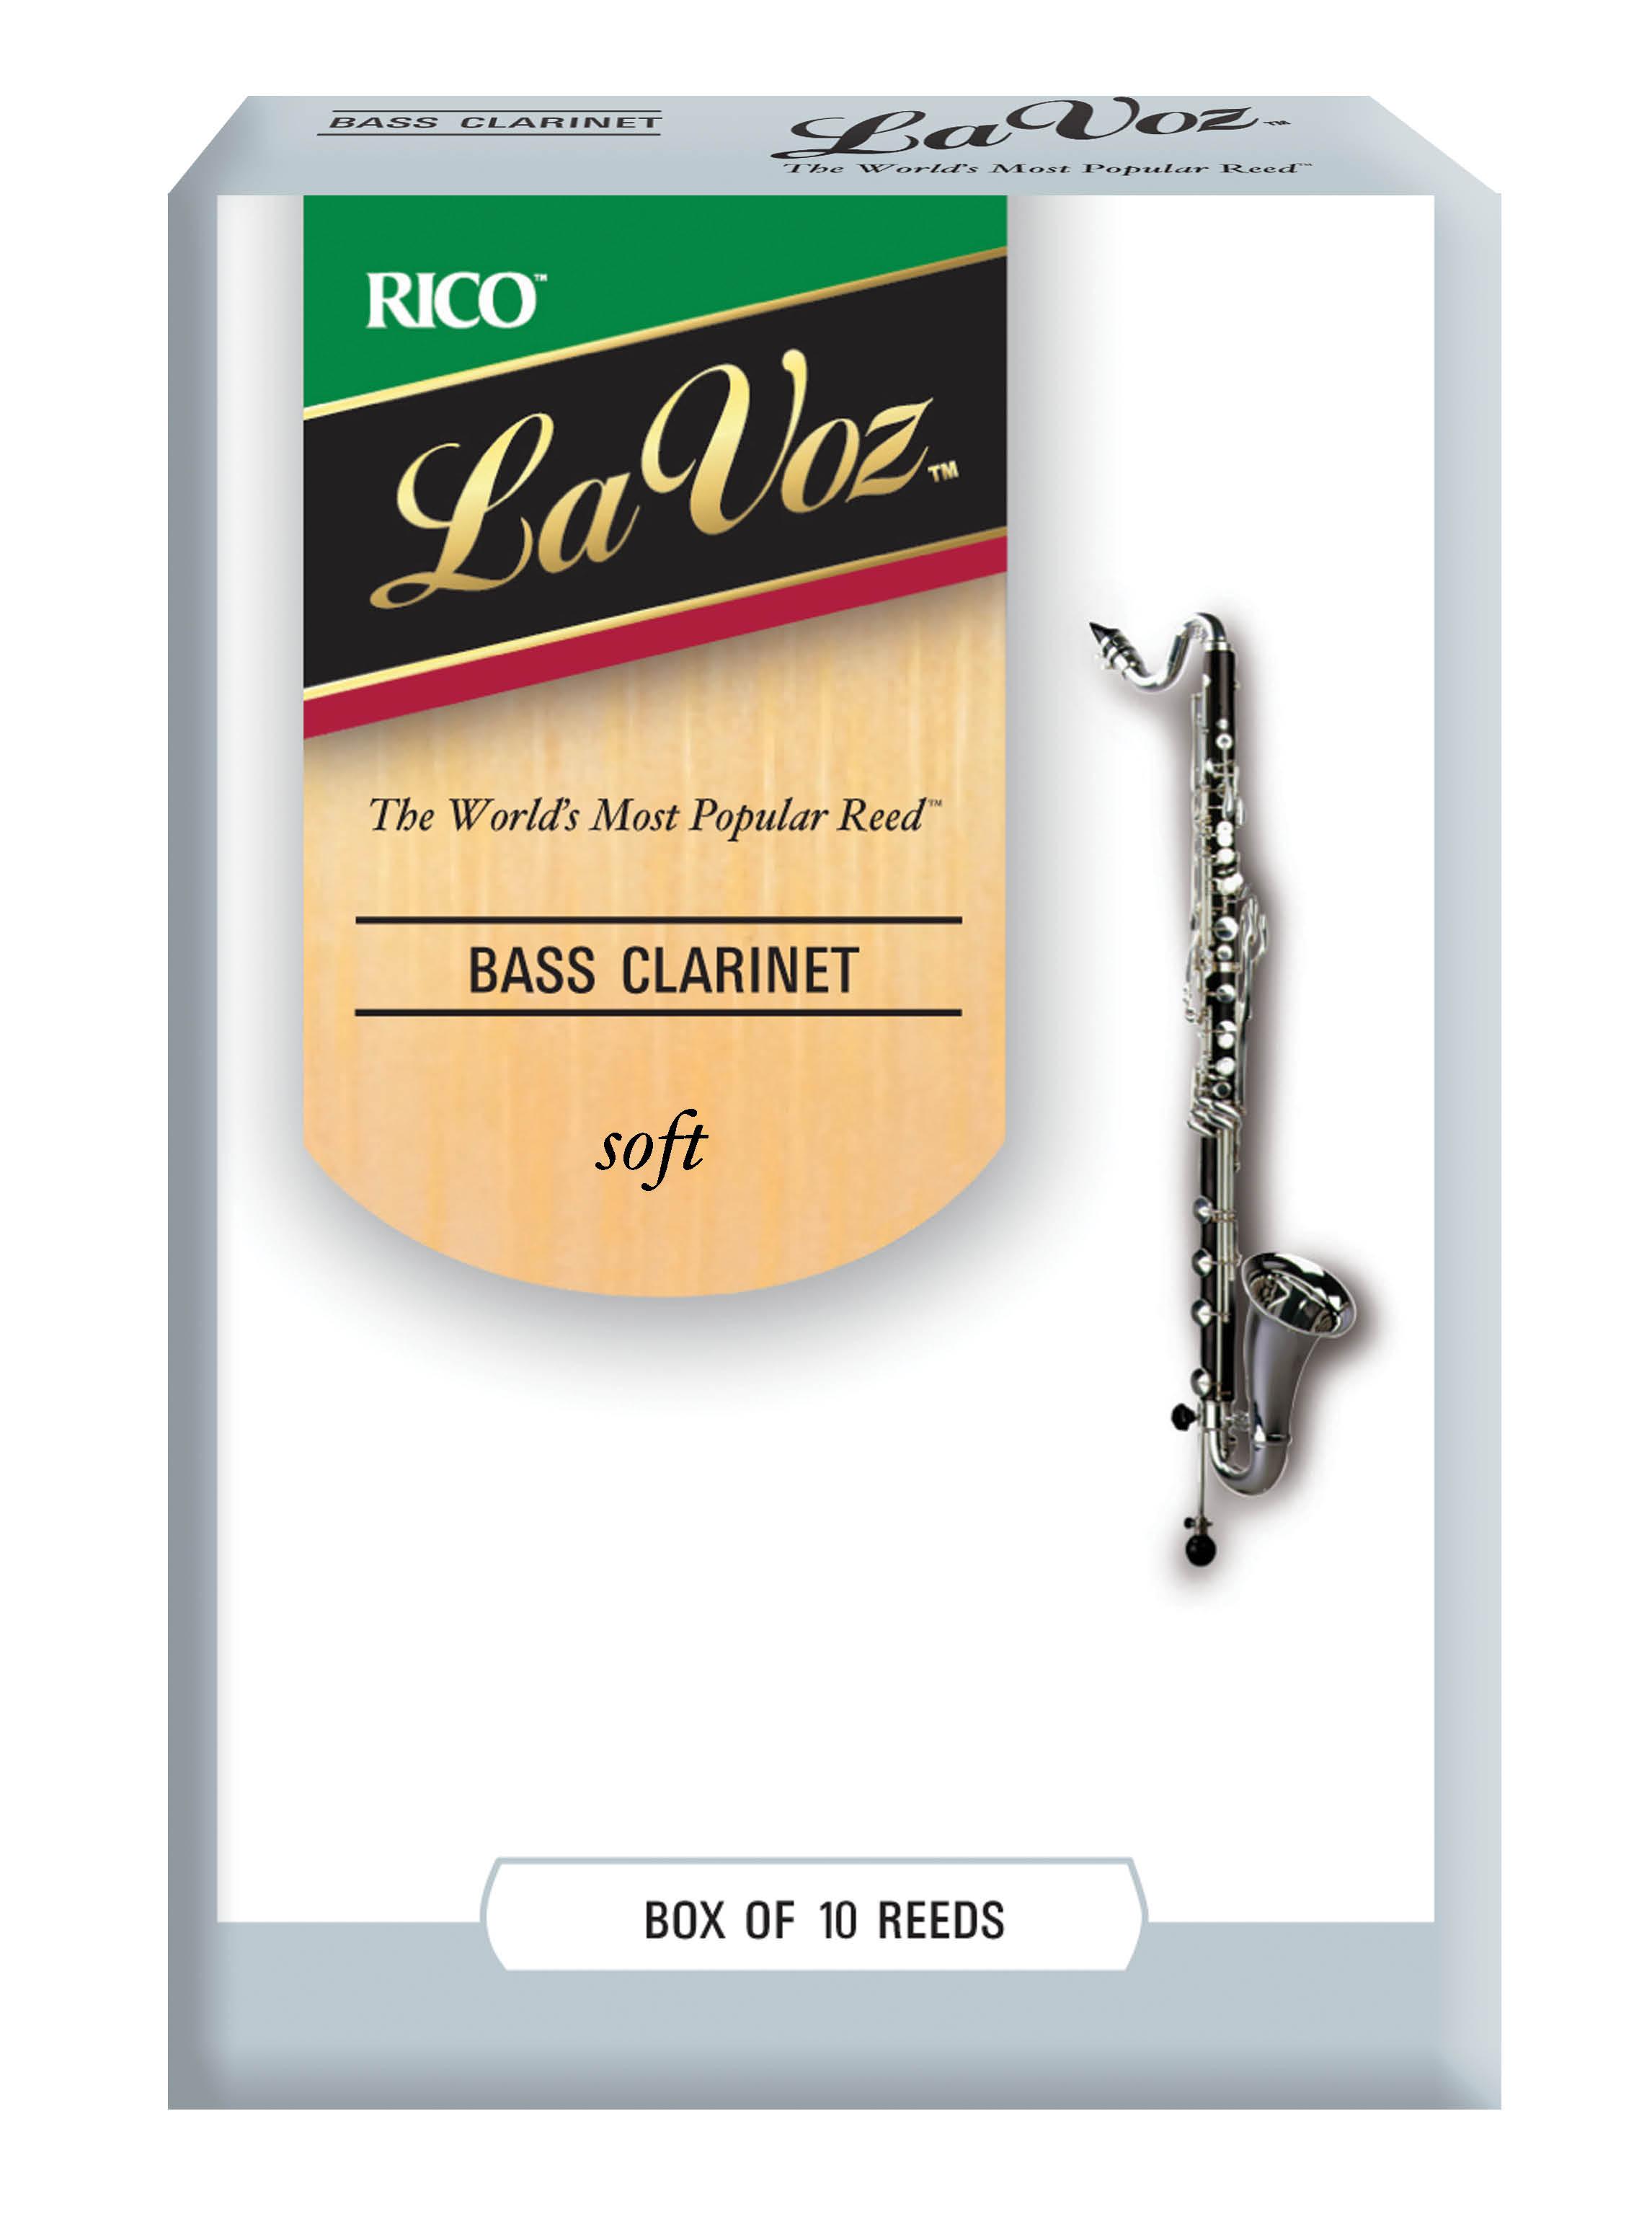 La Voz Soft Bass Clarinet Reeds